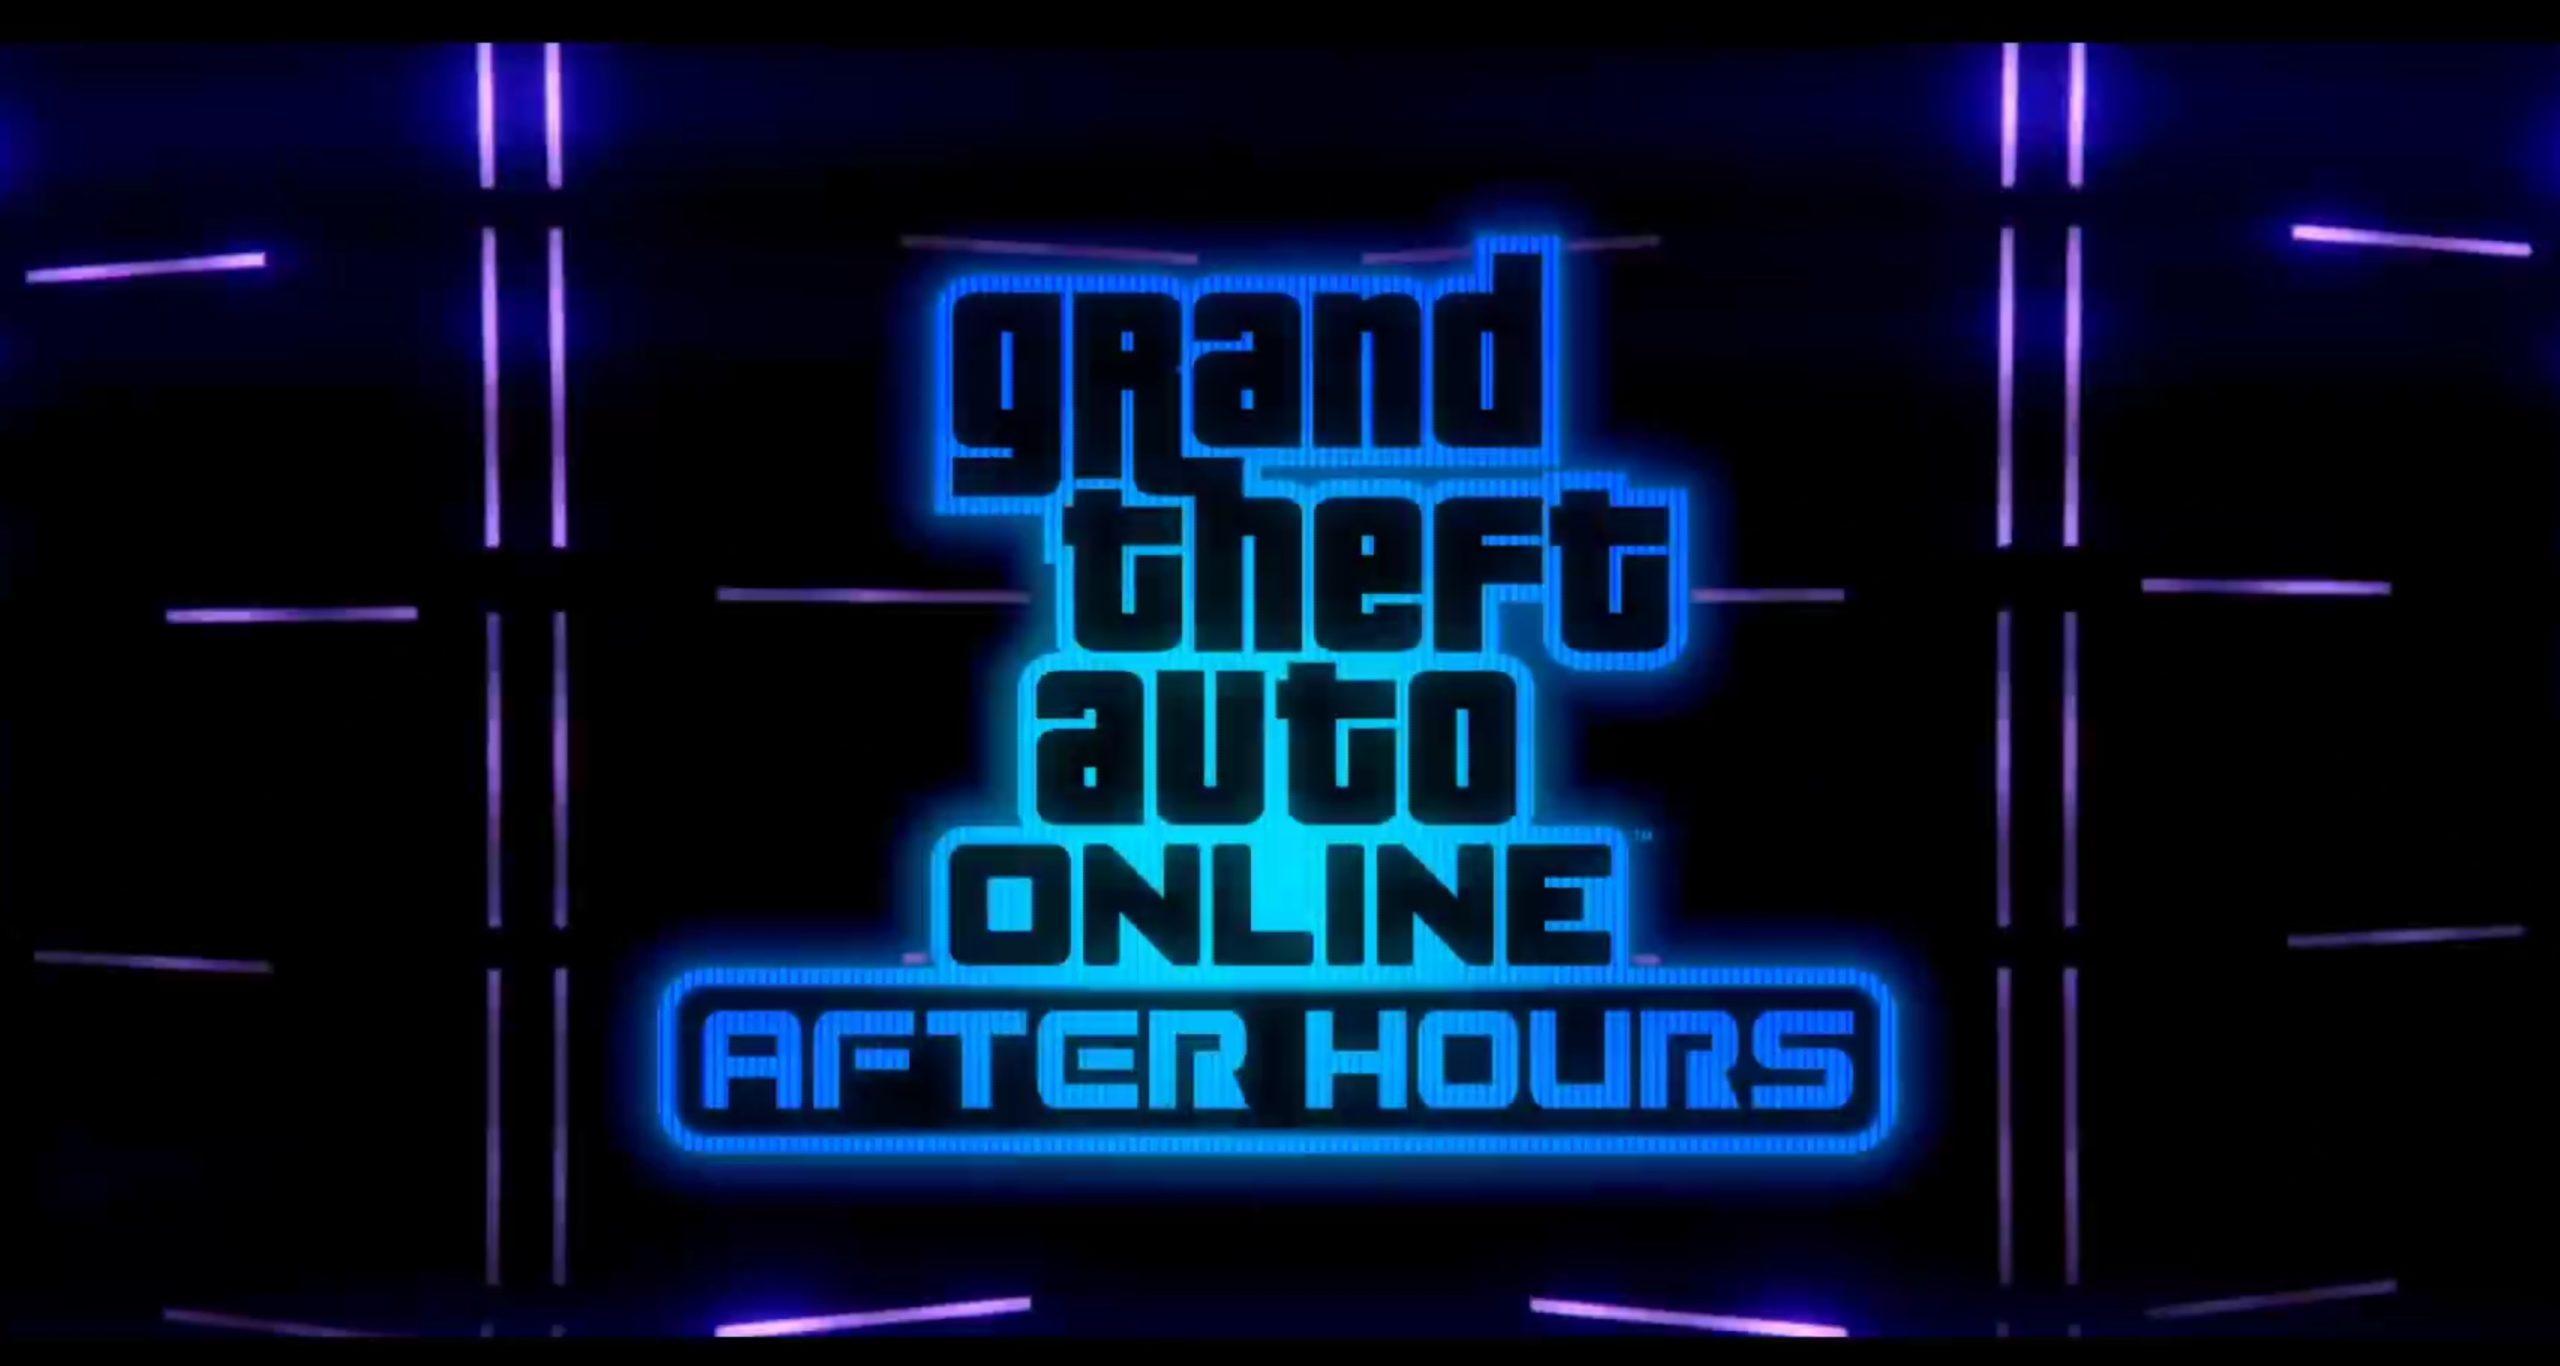 GTA Online Nightlife-Themed Update 'After Hours' Goes Live Next Week